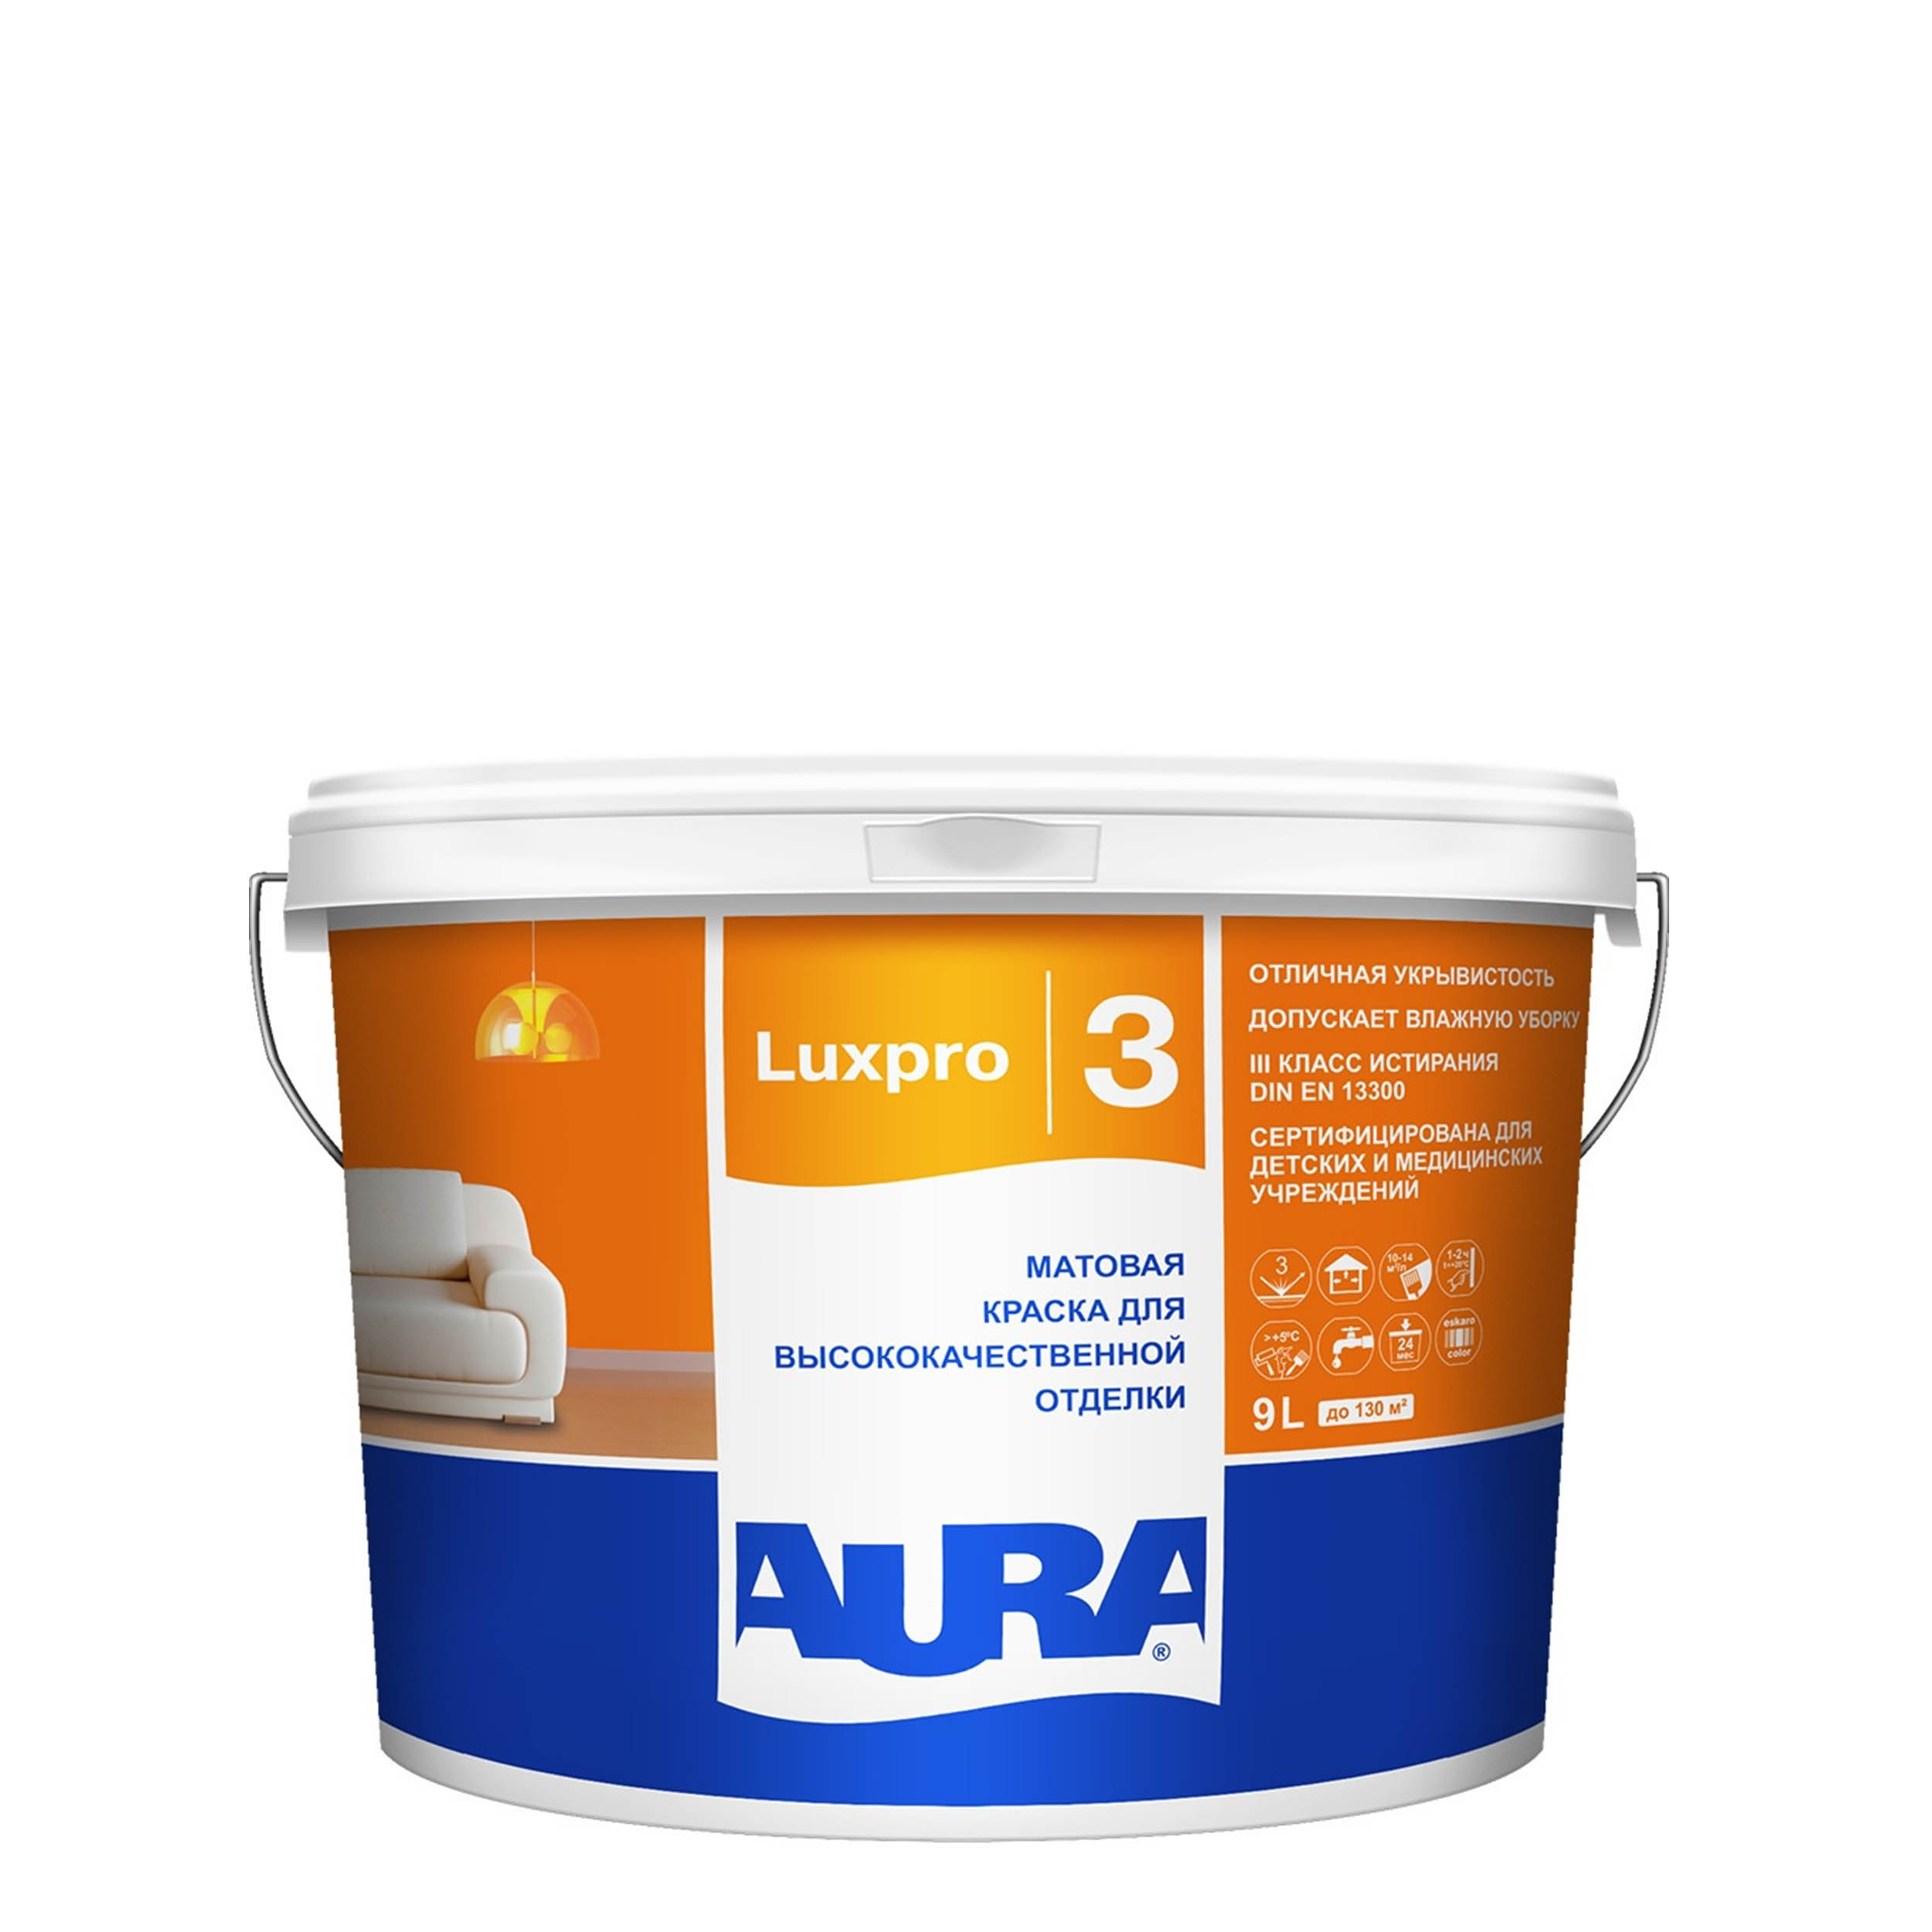 Фото 4 - Краска интерьерная, Aura LuxPRO 3, RAL 6028, 11 кг.